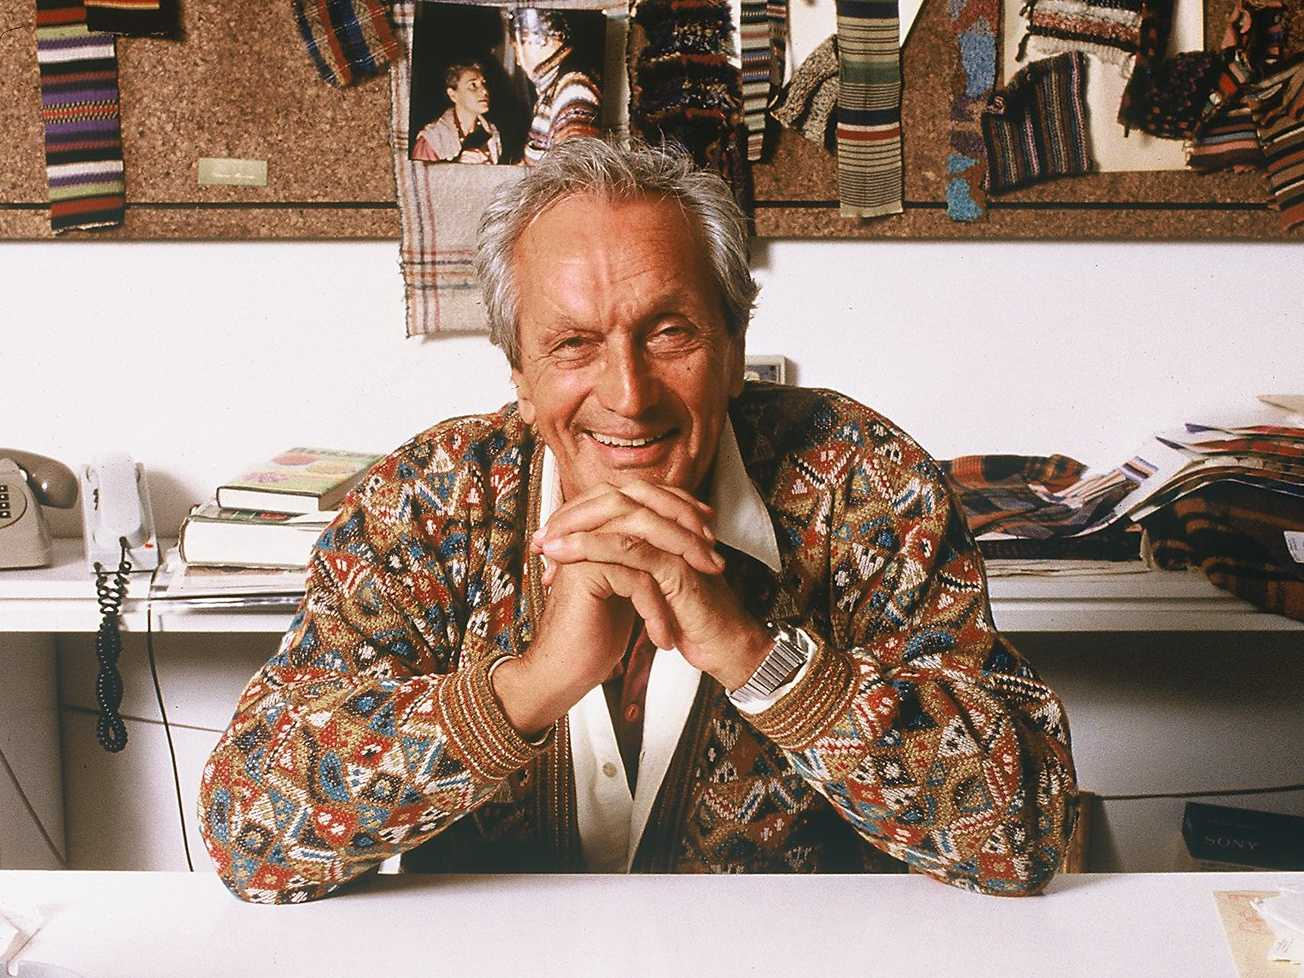 Ottavio-Missoni-Dies-at-92 -